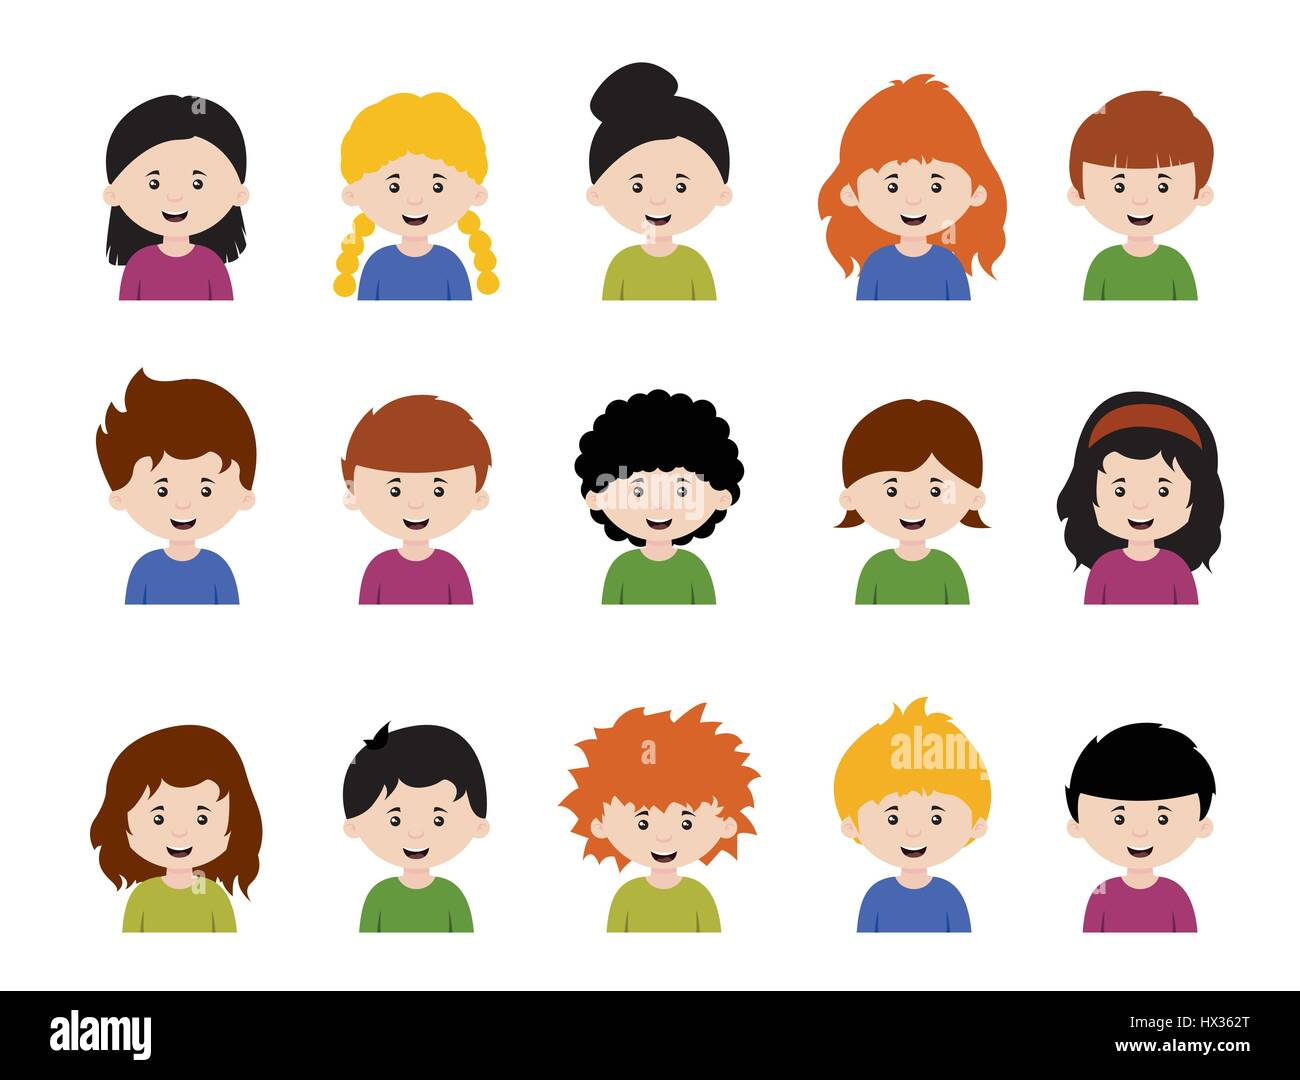 Set Of Cartoon Childrens Faces Stock Vector Art More: Big Set Of Kids Avatars,cute Cartoon Boys And Girls Faces